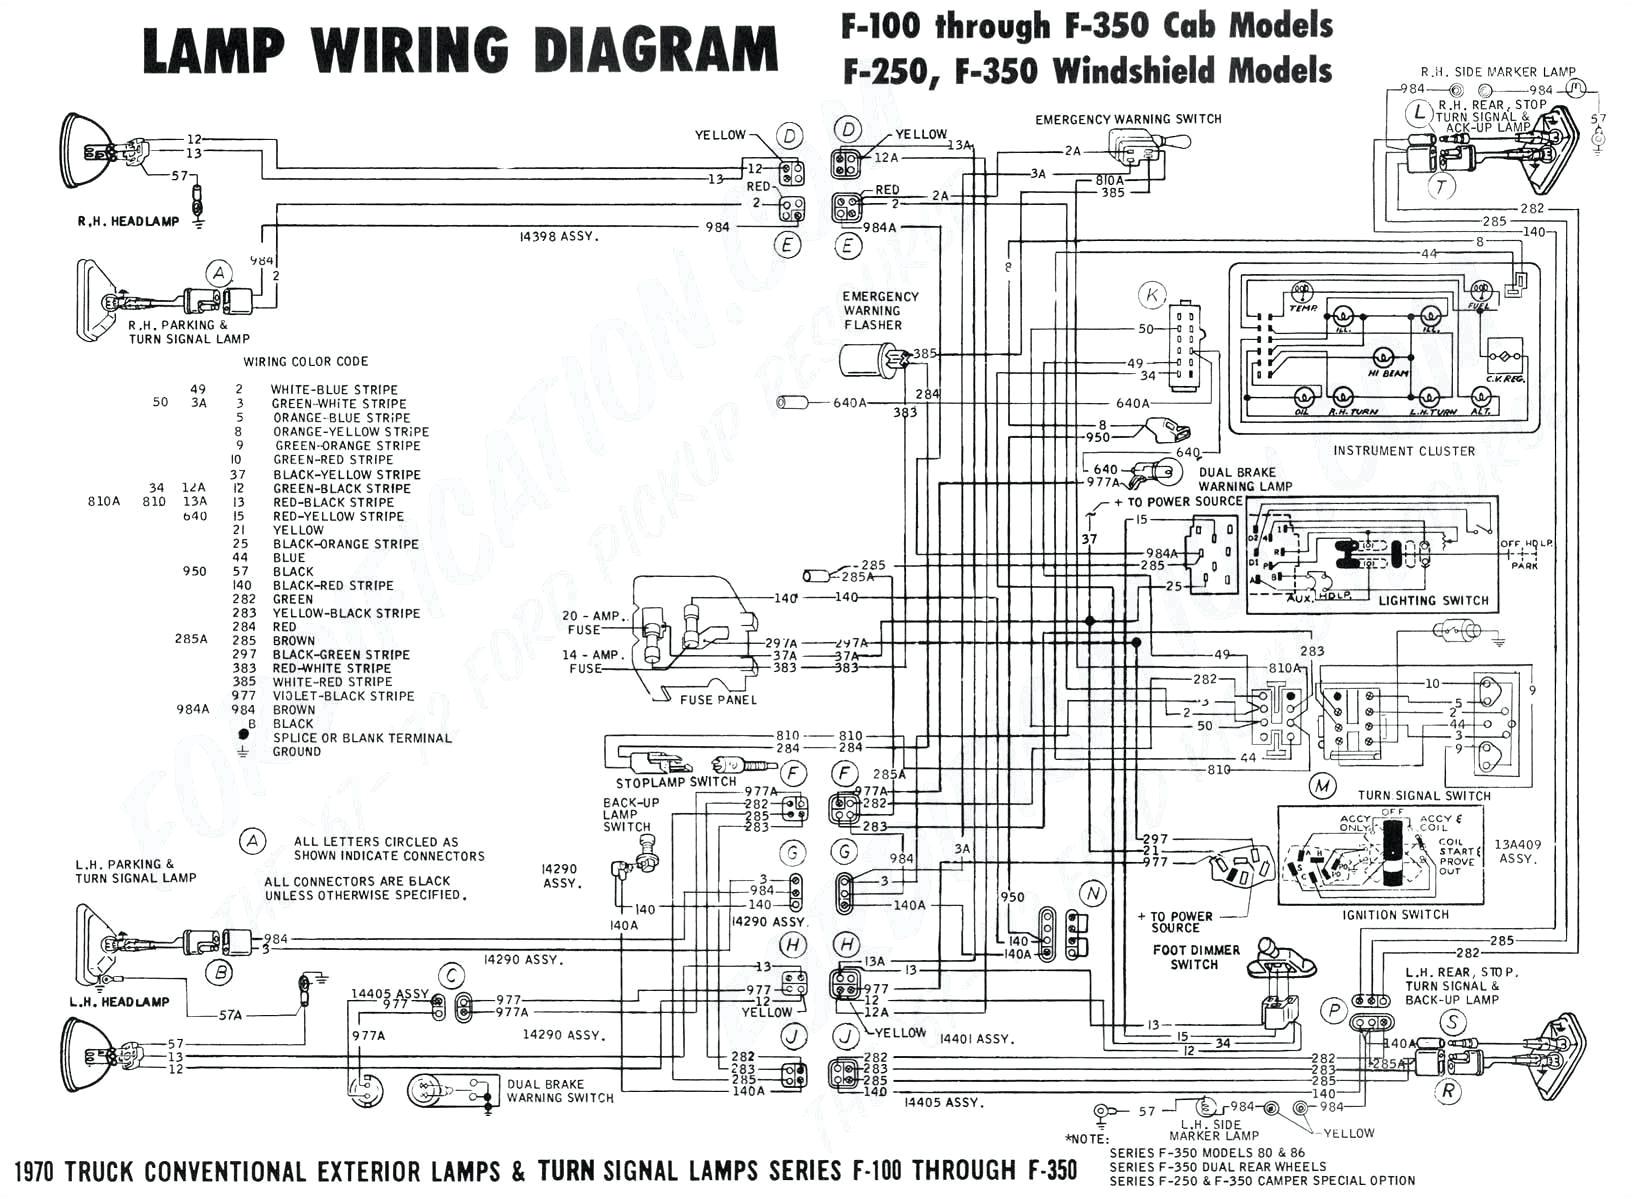 1977 f250 wiring harness wiring diagram 1977 f250 wiring diagram wiring diagram2006 4wd wiring diagram wiring